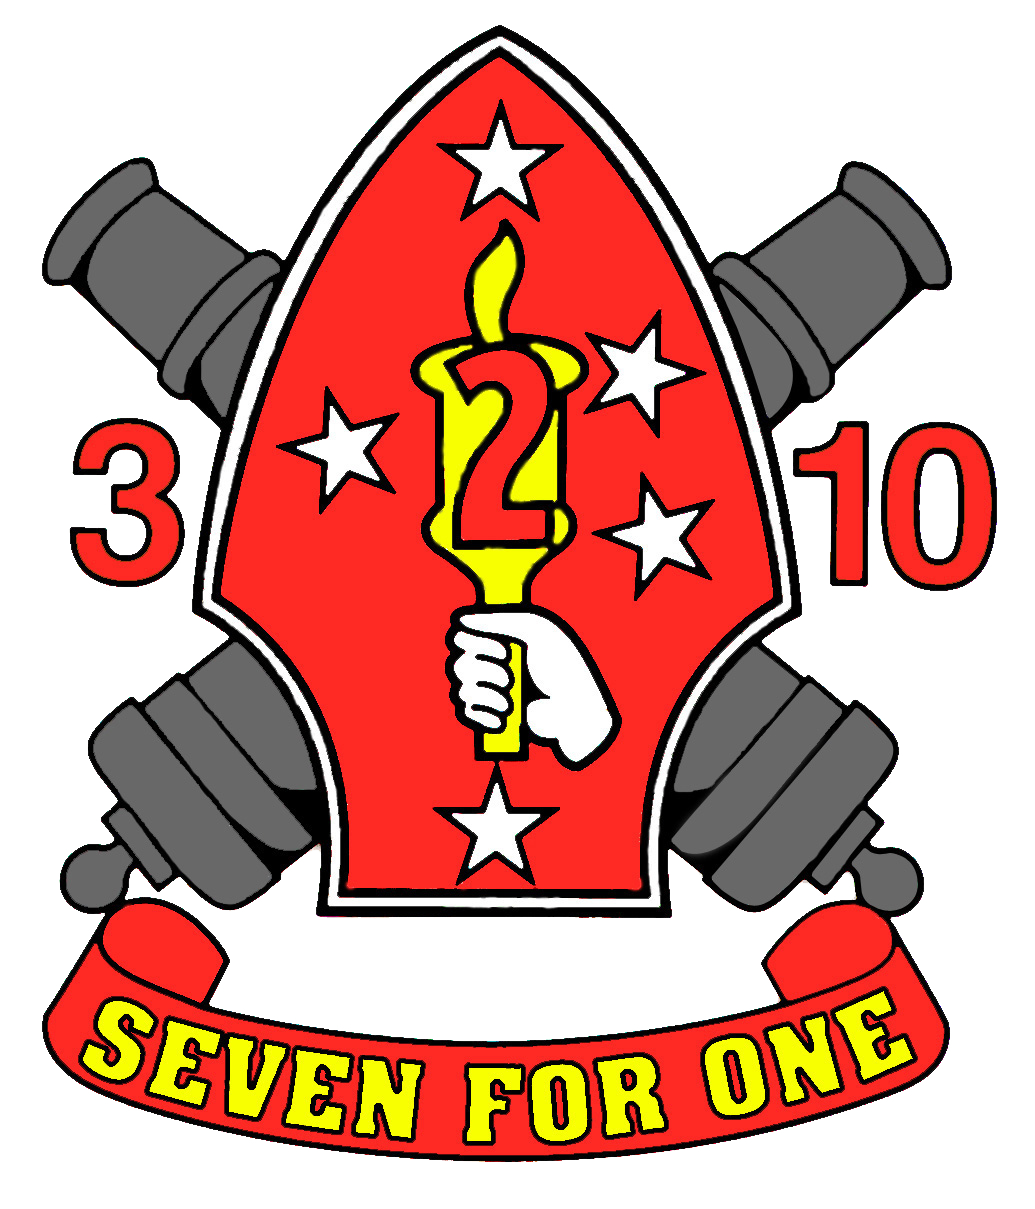 3rd Battalion, 10th Marines - Wikipedia